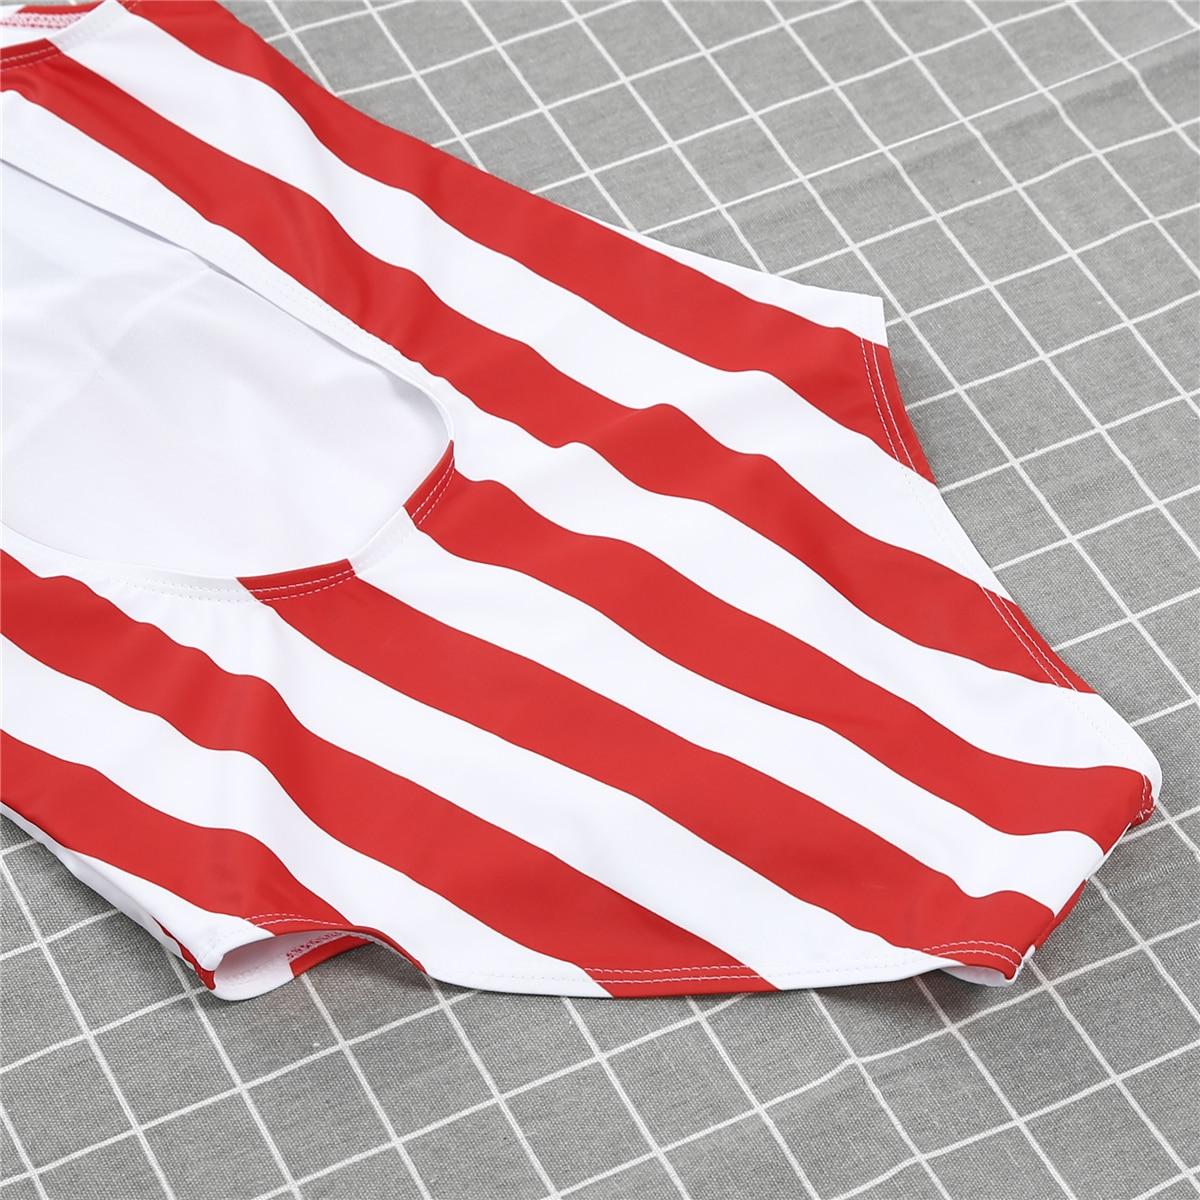 2019 New Sexy Womens One Piece Push Up Padded Monokini Beach Striped Backless Swimwear Swimsuit Bikini Bathing Suits Beachwear-2